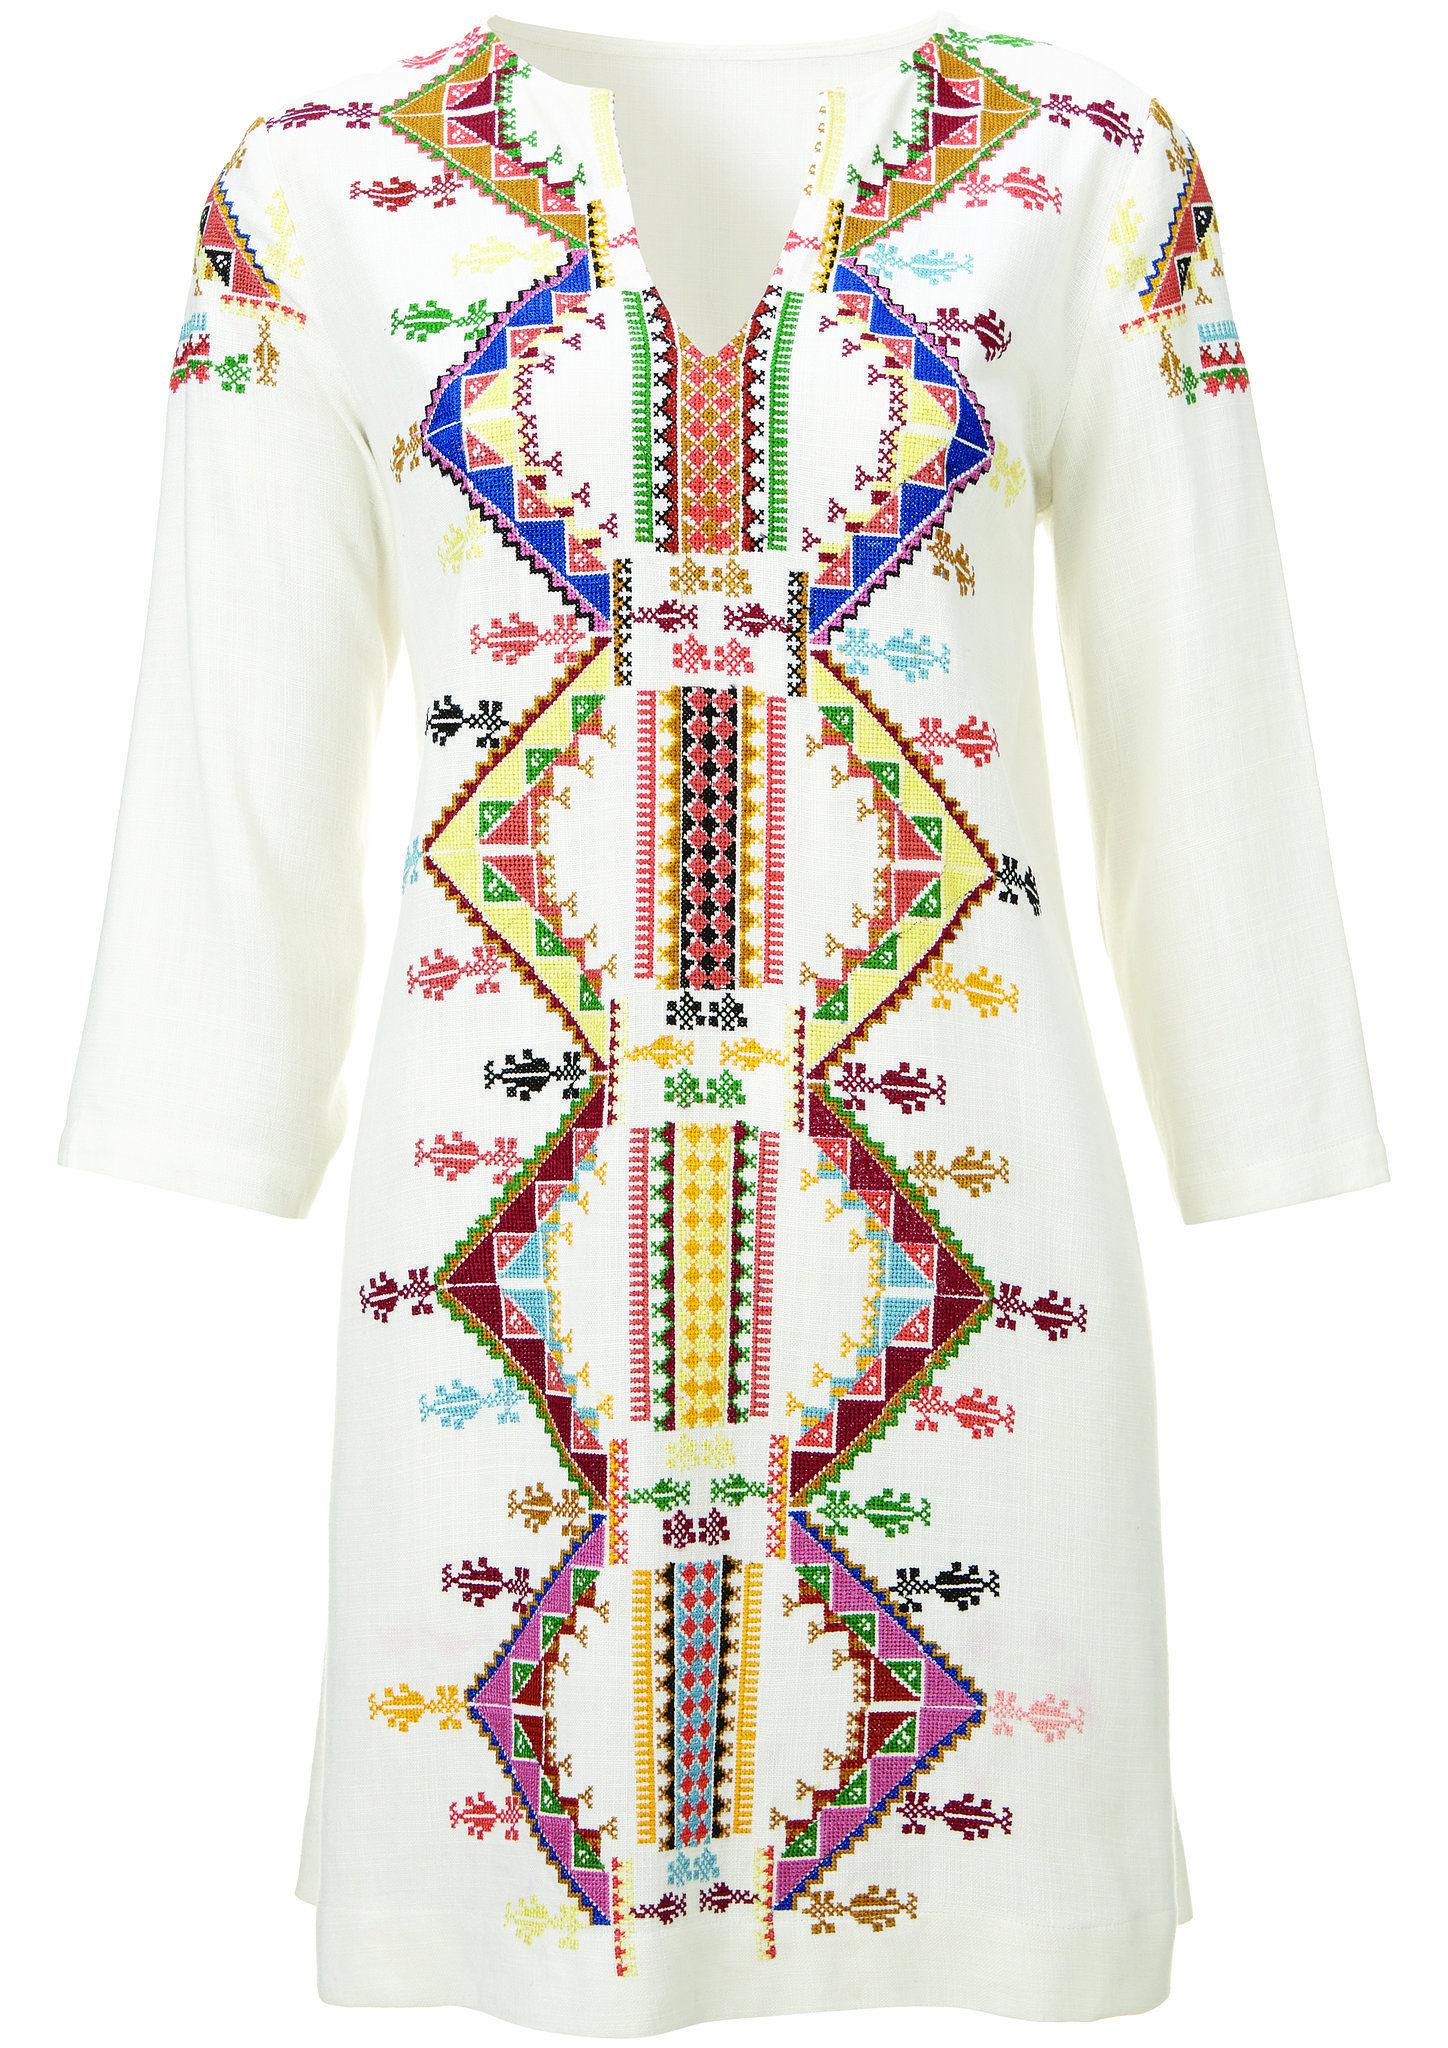 Kourtney Kardashian and Kate Moss for Topshop Embroidered Smock Dress Link